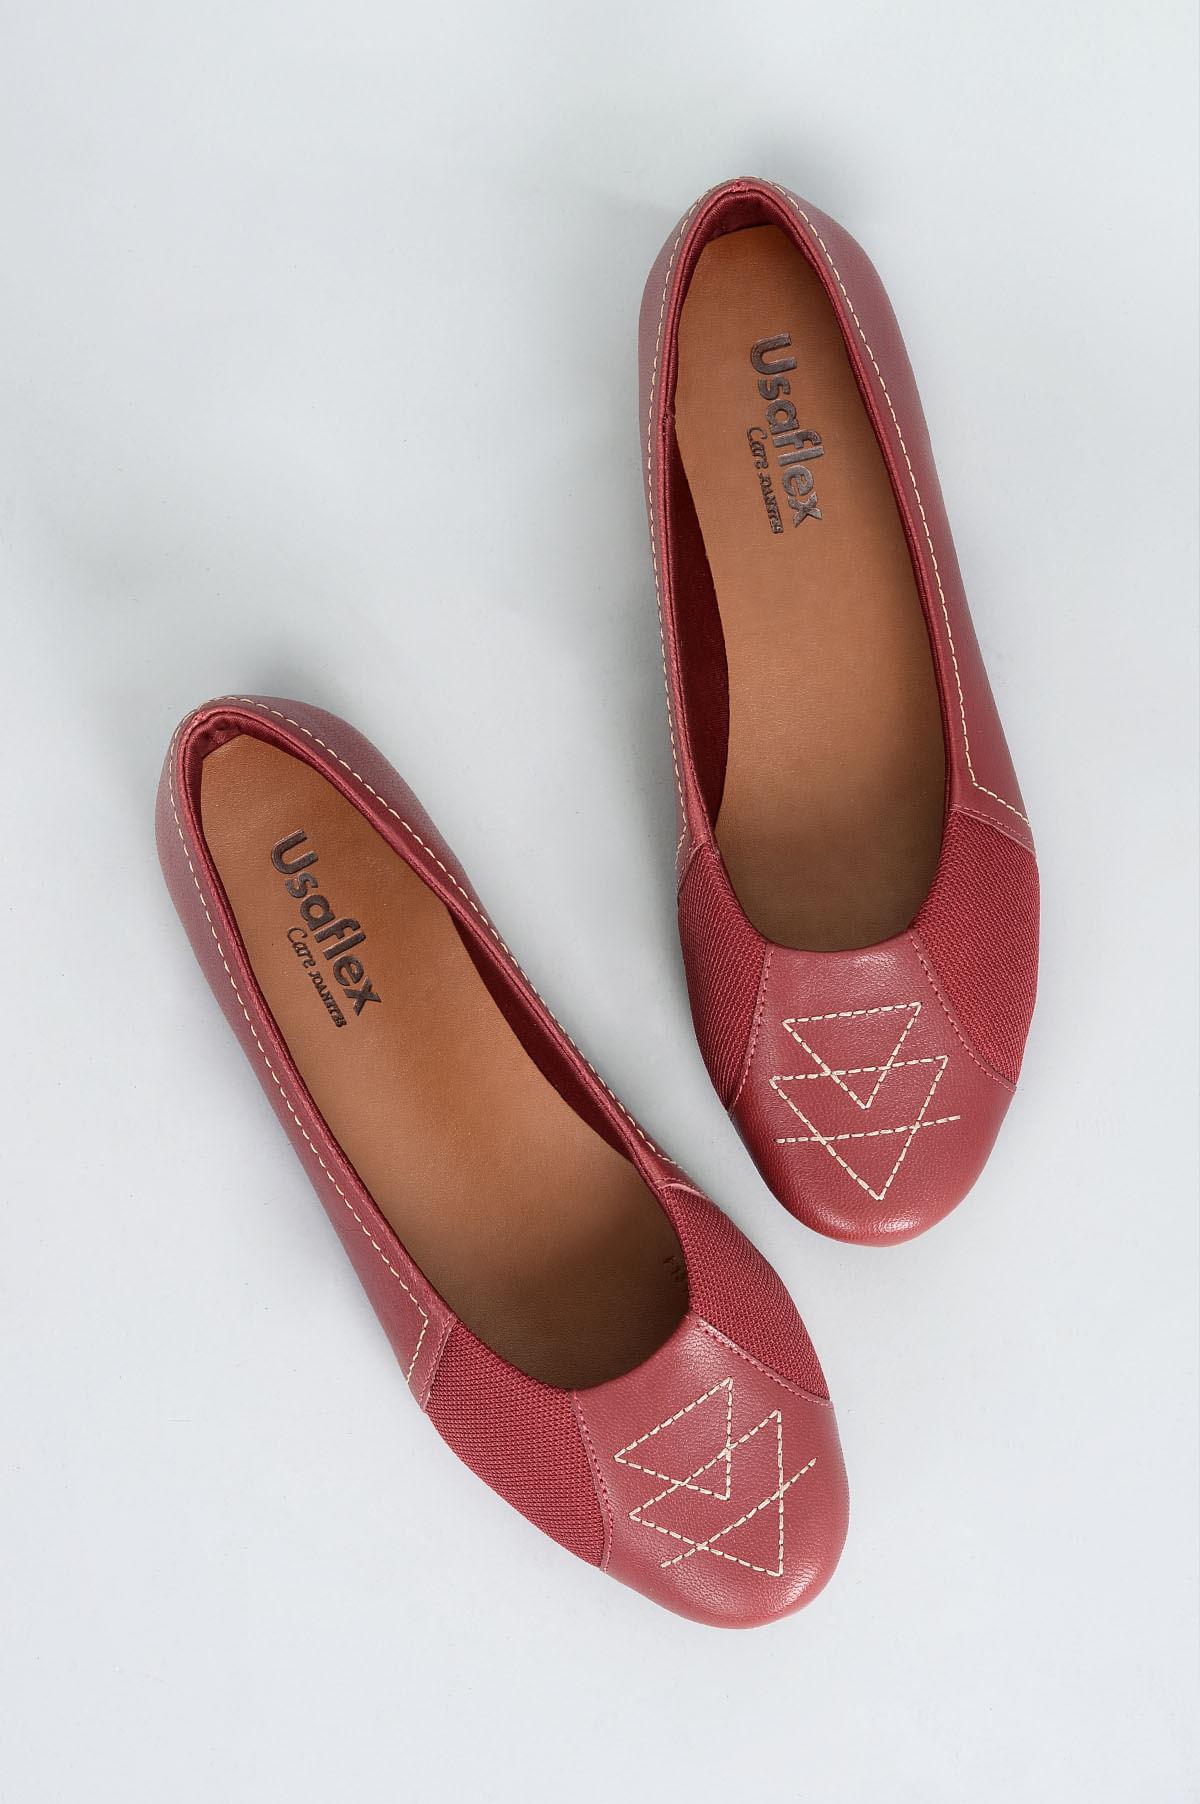 5c87db3fc6 Sapatilha Feminina Siena Usaflex CR-VERMELHO - Mundial Calçados